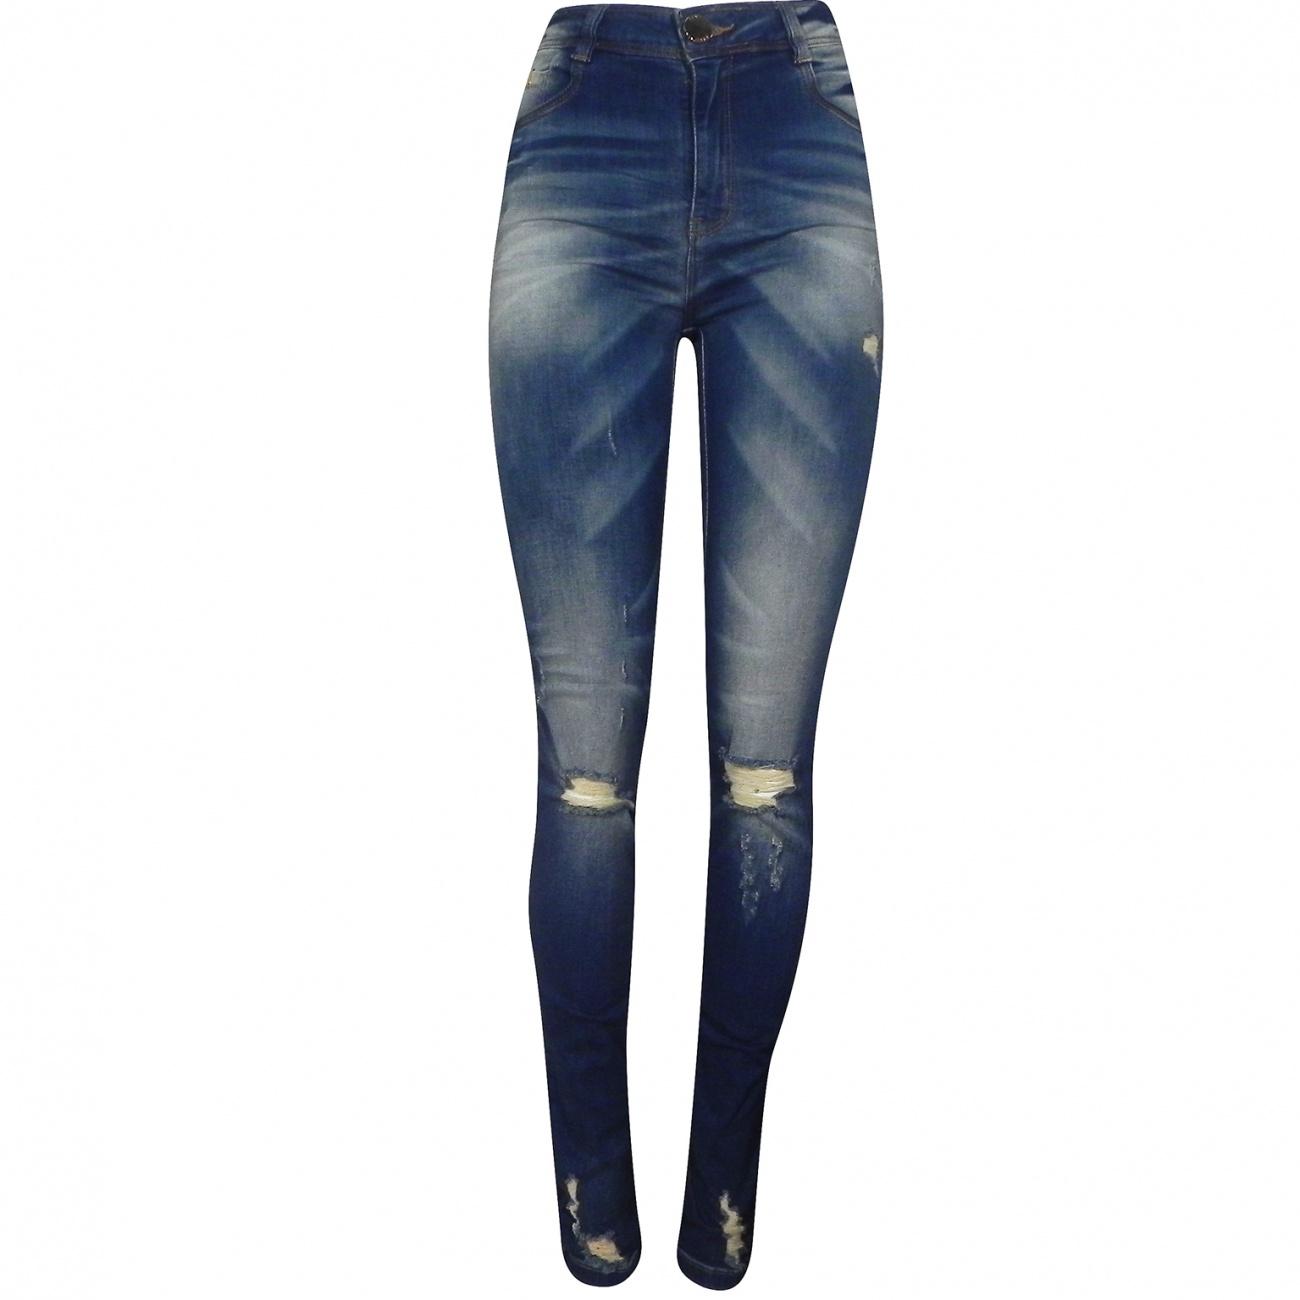 a14da8b34 Calça Jeans Kim Super Skinny Dimy - Pole Modas